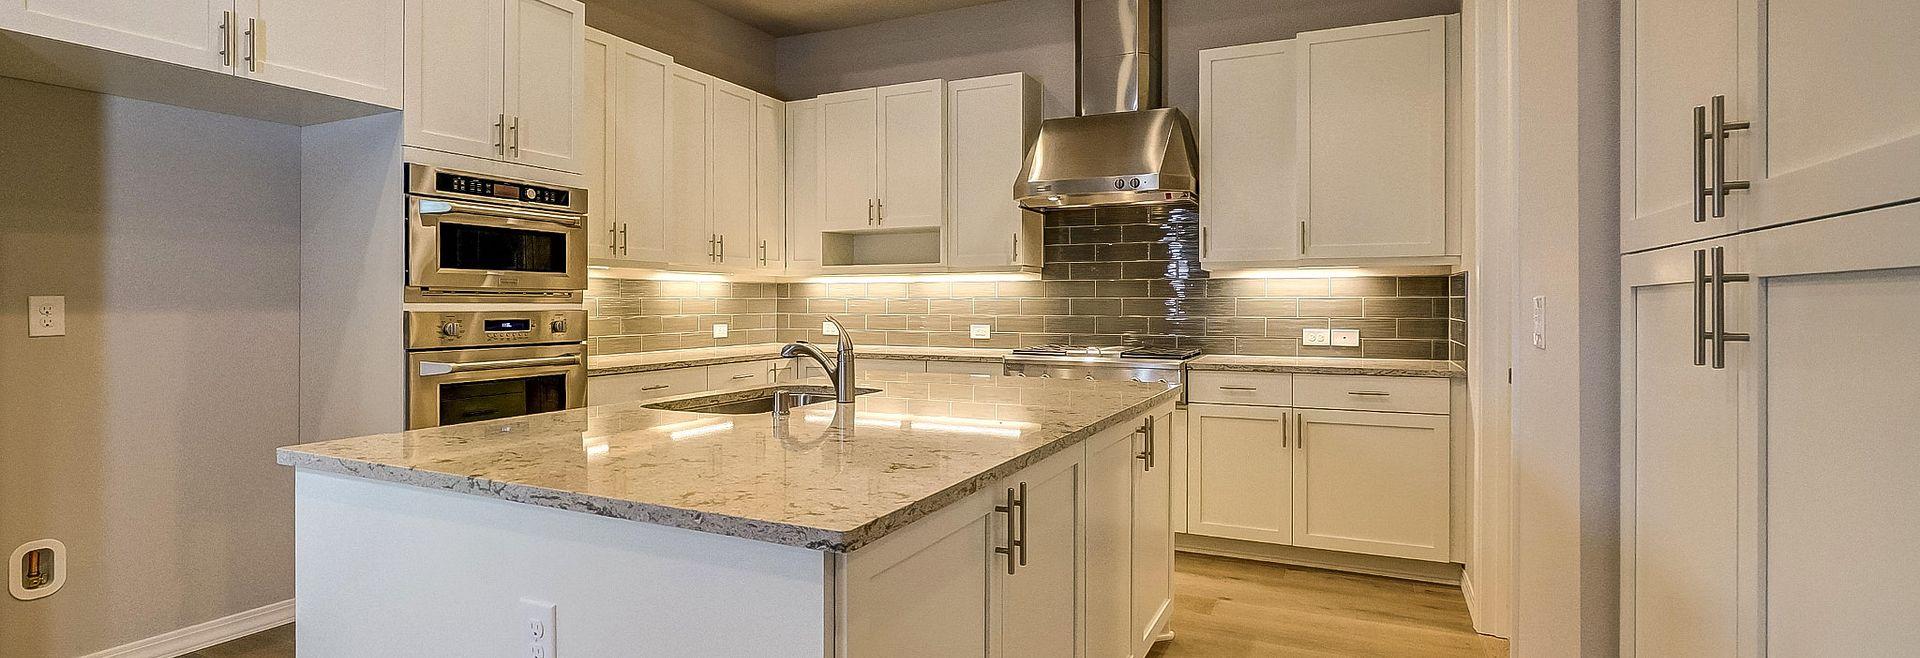 Shea Homes at Jubilee QMI 0074 Kitchen